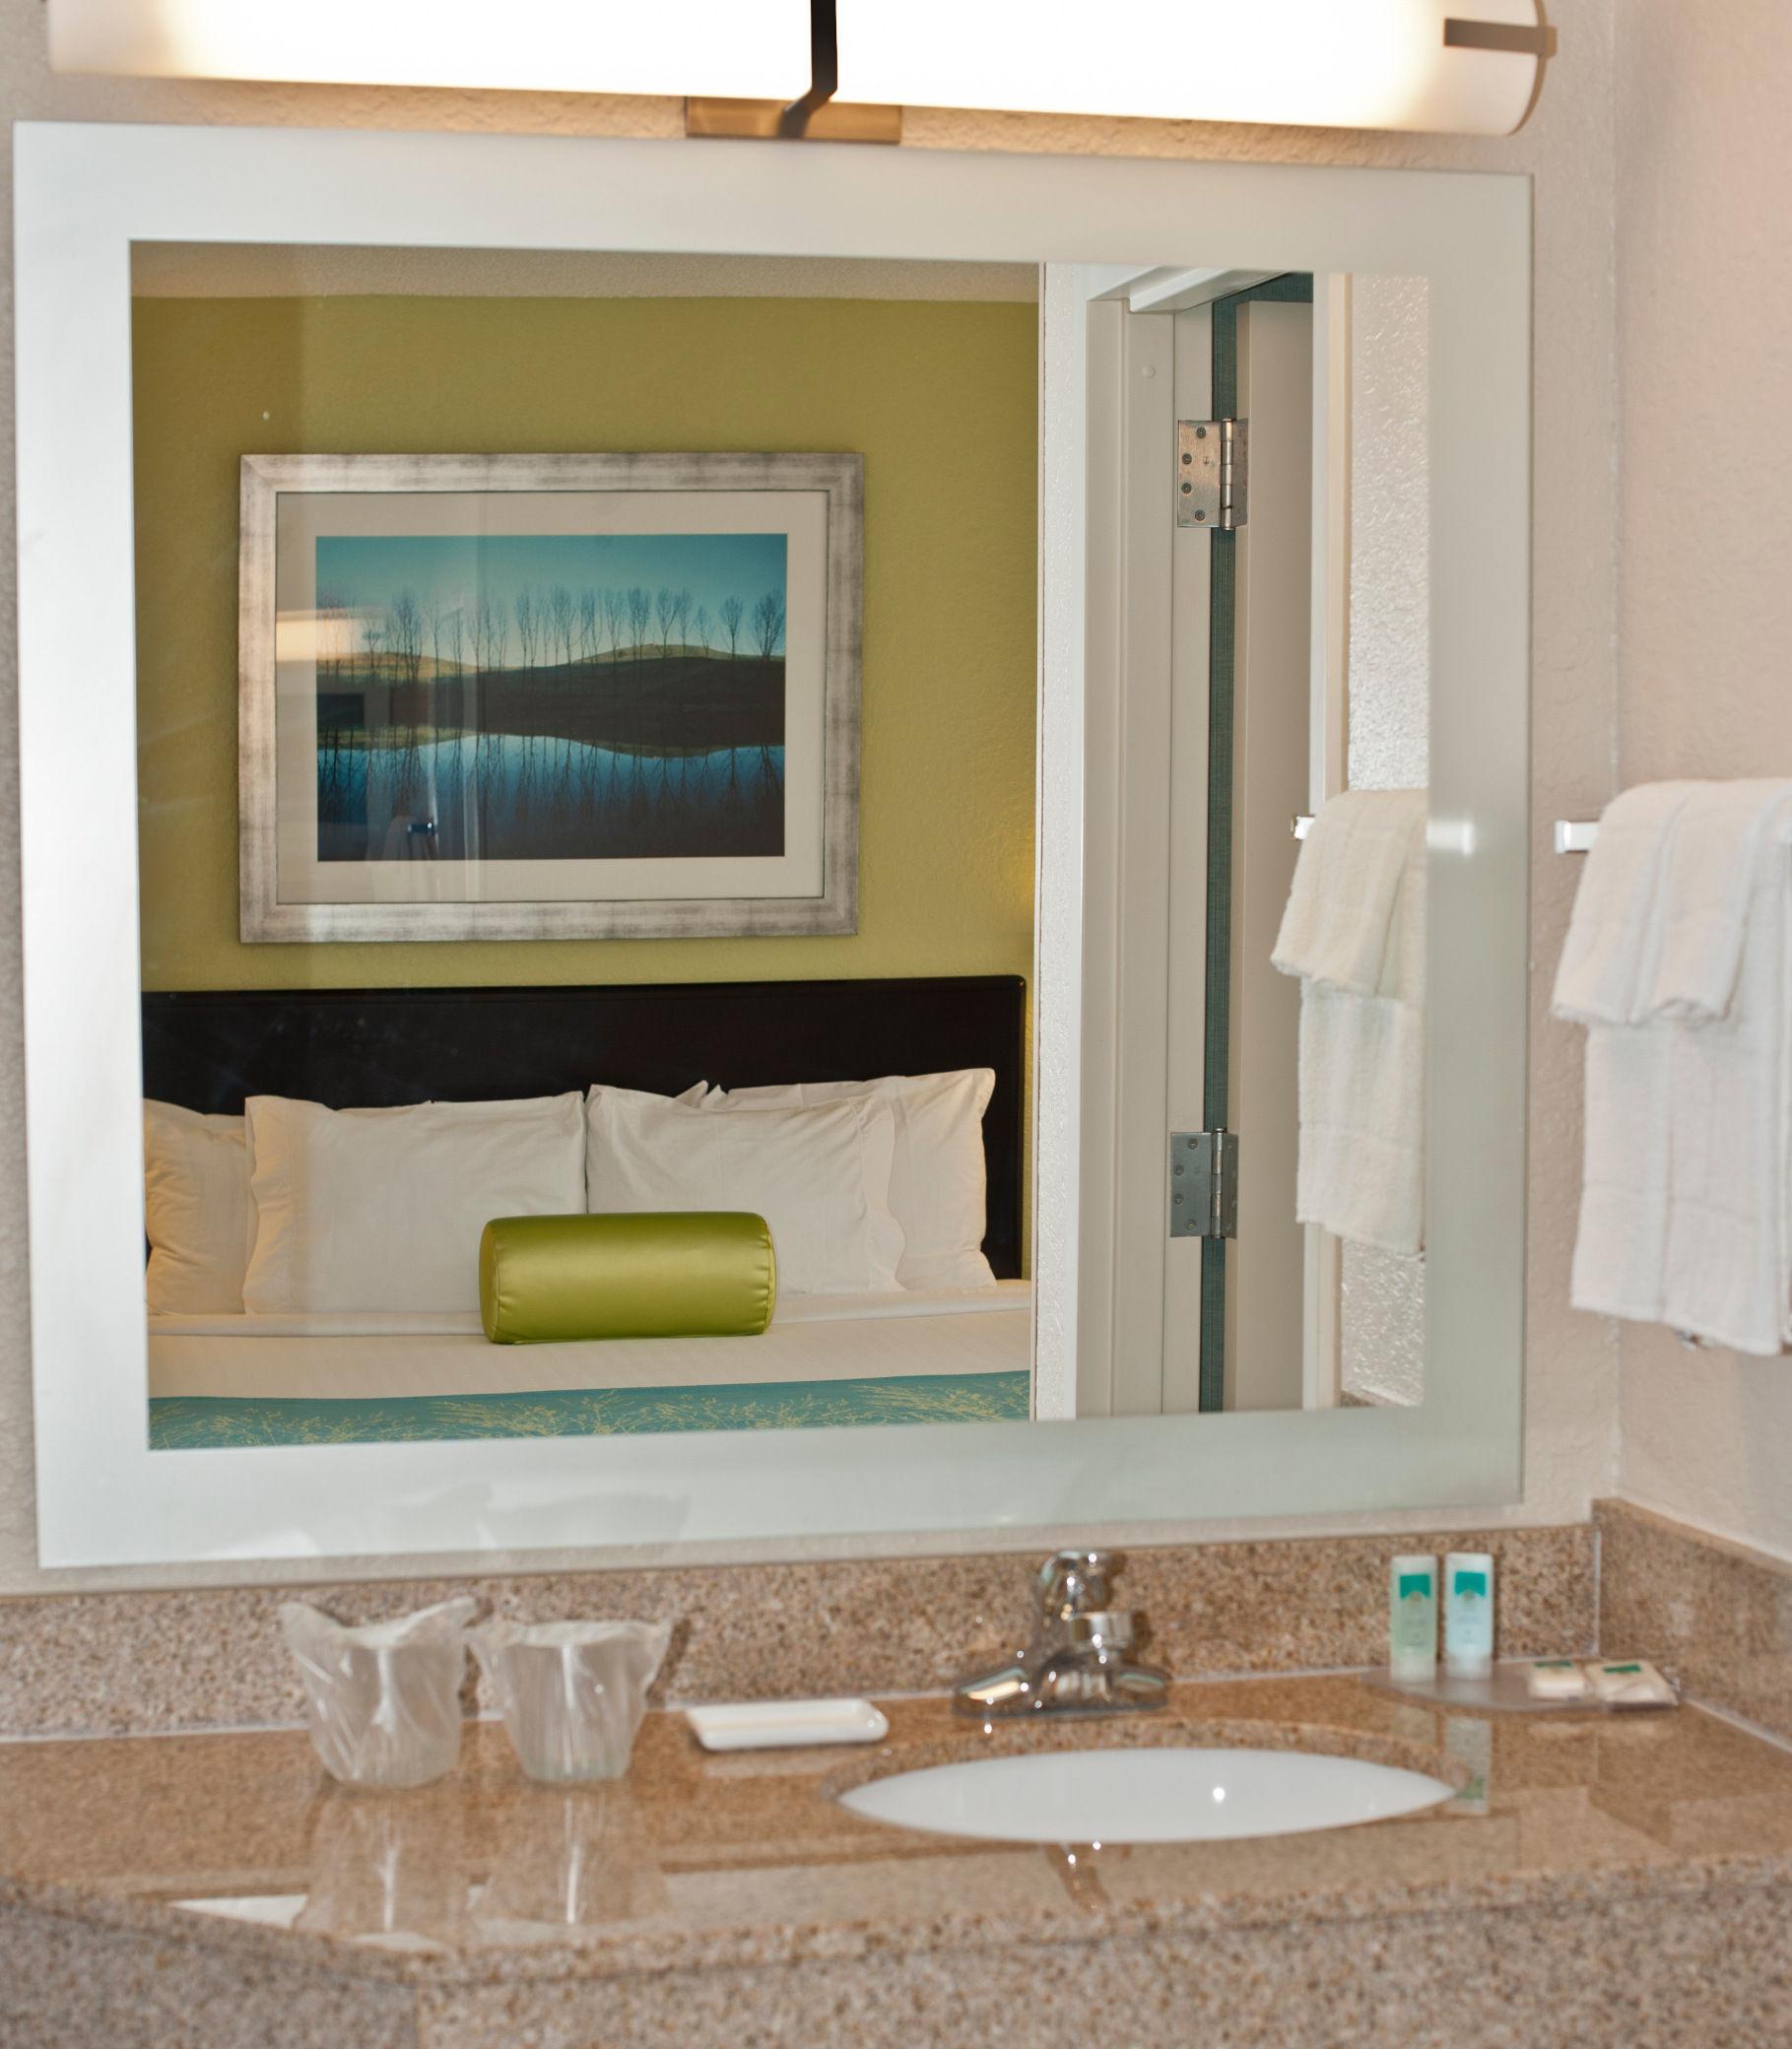 SpringHill Suites by Marriott San Antonio Medical Center/Northwest image 7